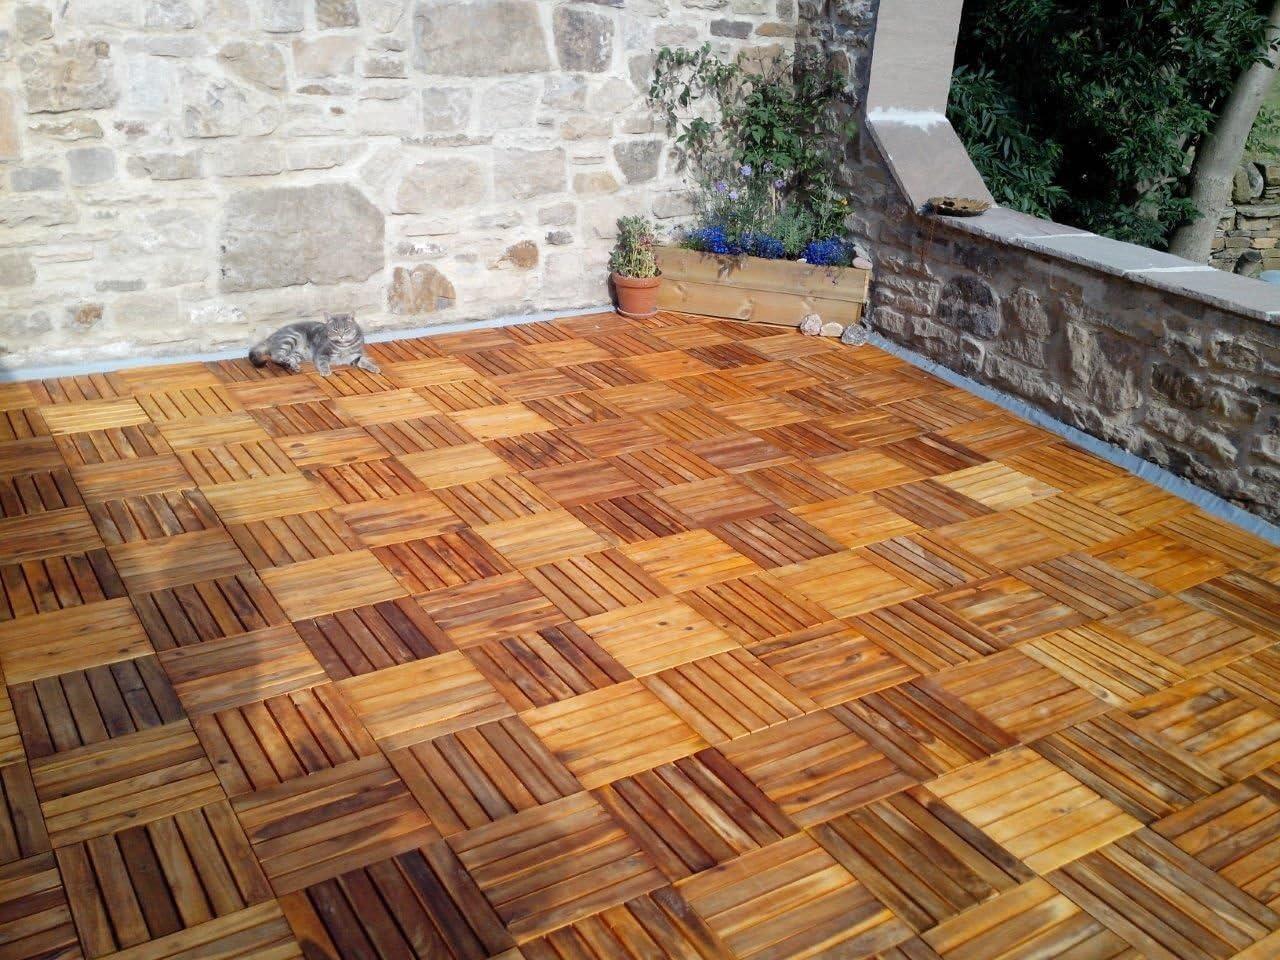 Balcony Hardwood Decking Tiles Patio 12 x Hardwood Tiles Click-Deck Roof Terrace Hot Tub Deck Tiles Flooring Decking